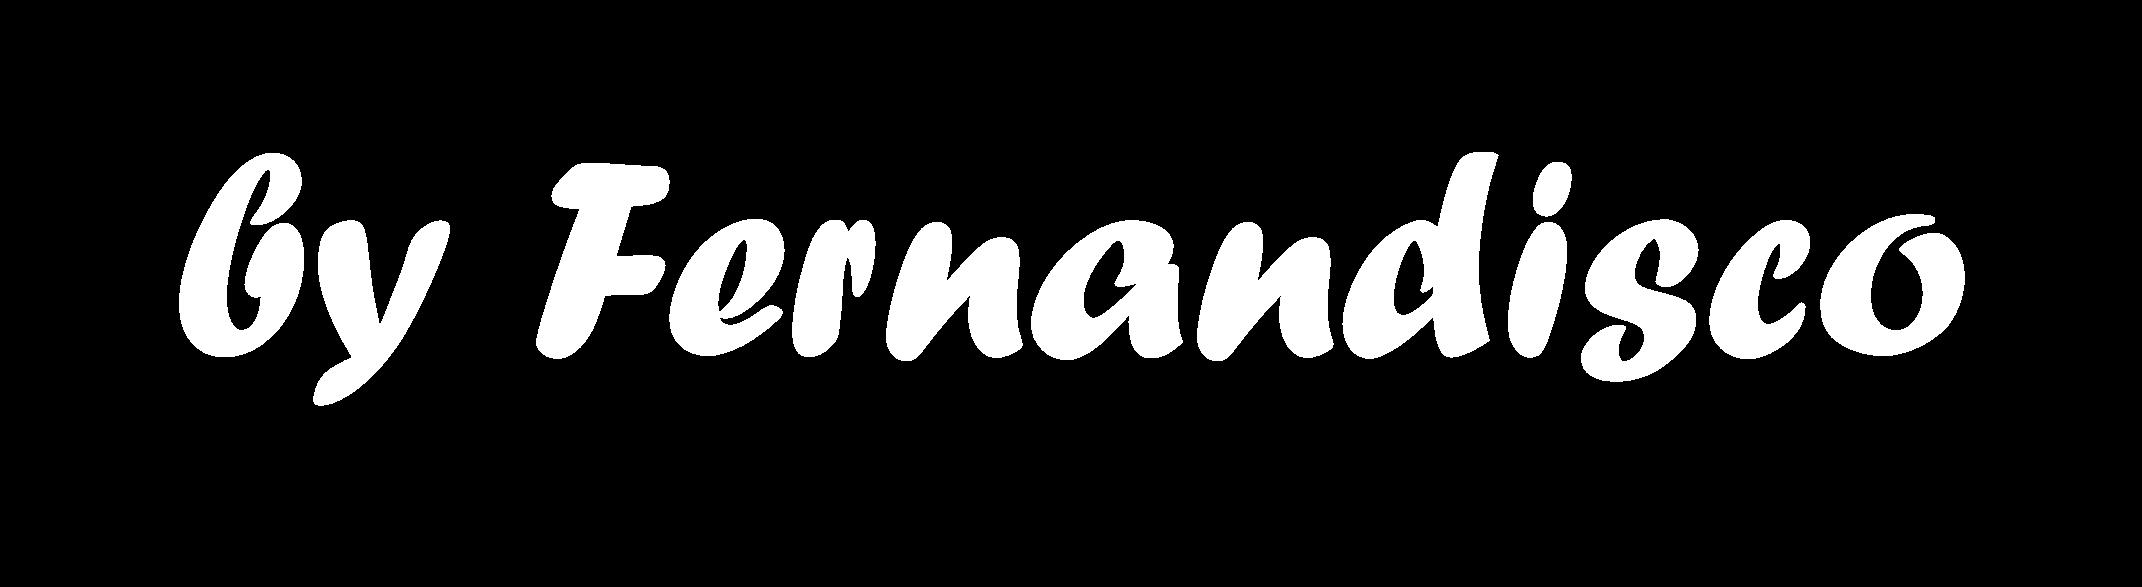 FERNANDISCO